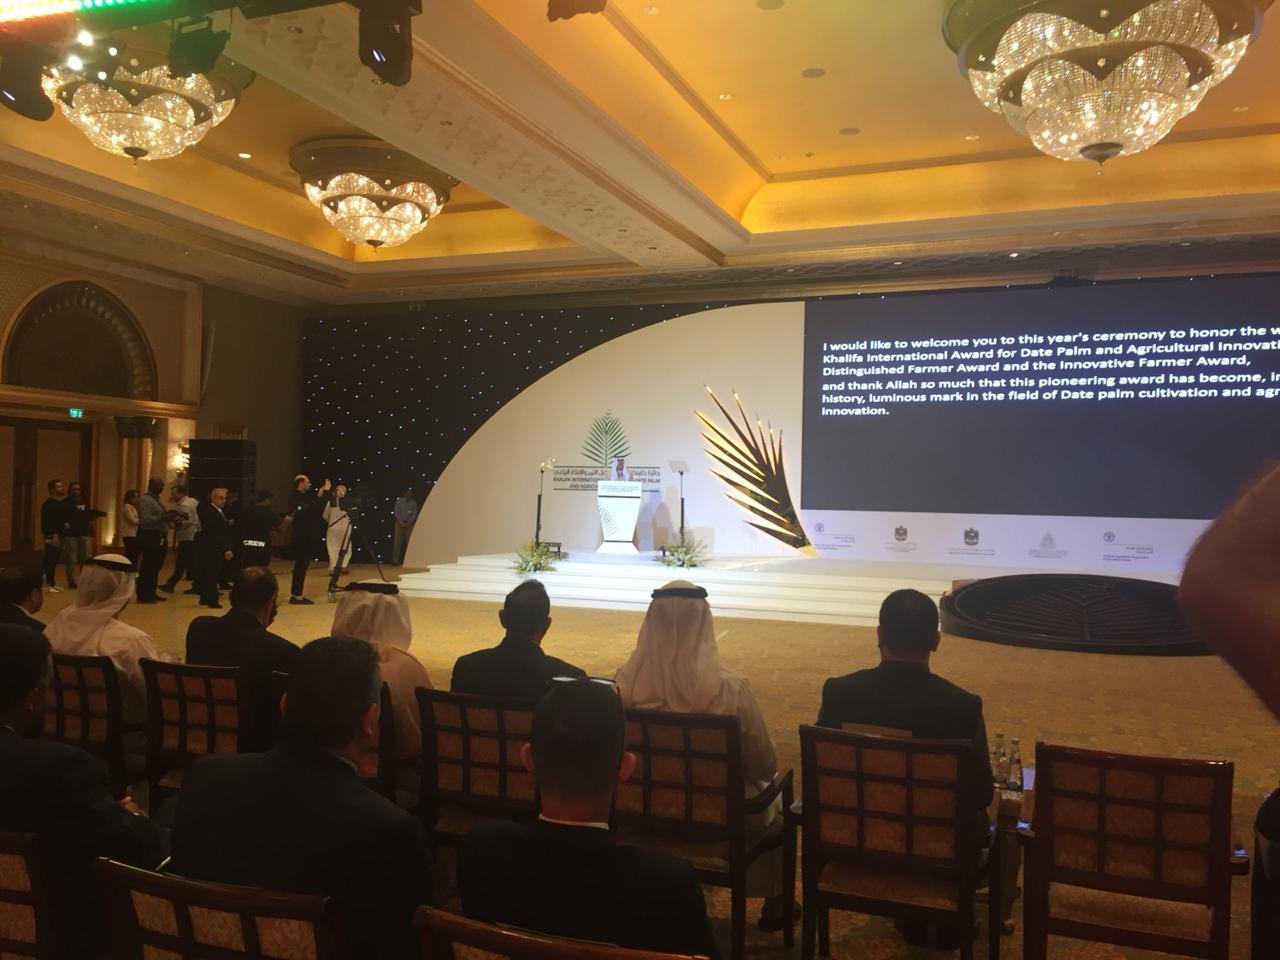 127-142016-award-pass-khalifa-international-emirates-3